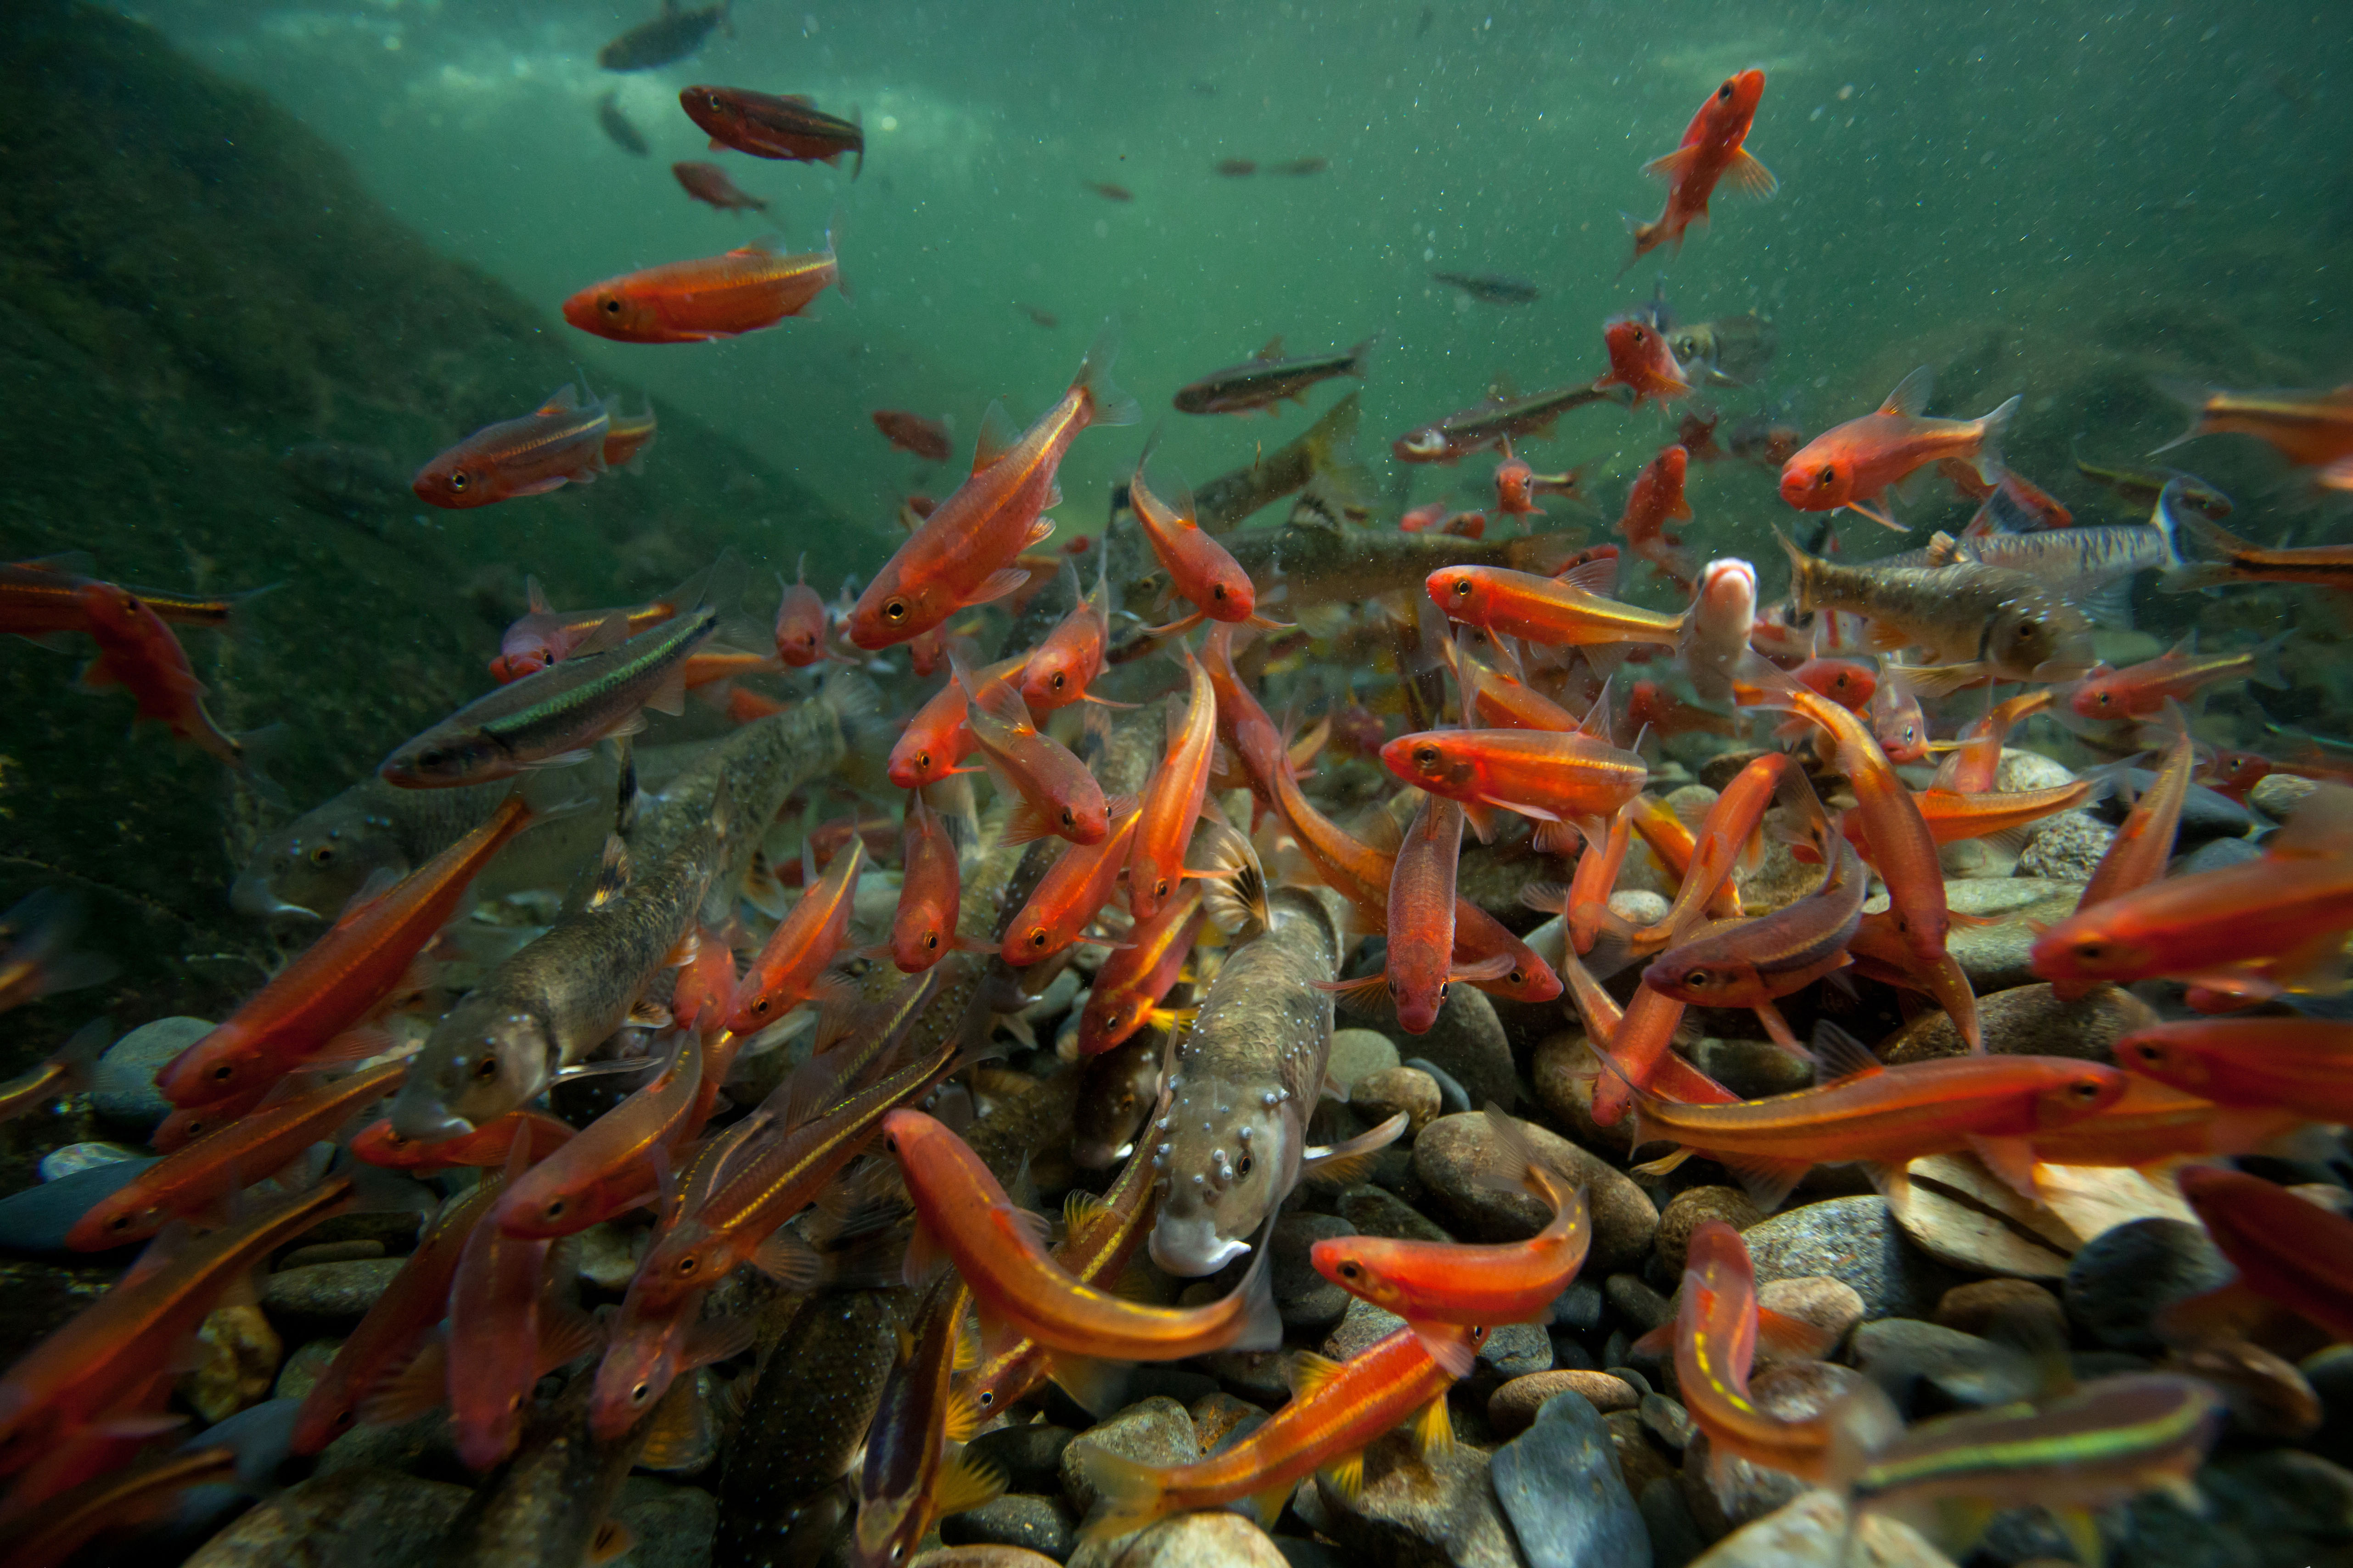 Hidden Rivers Fish